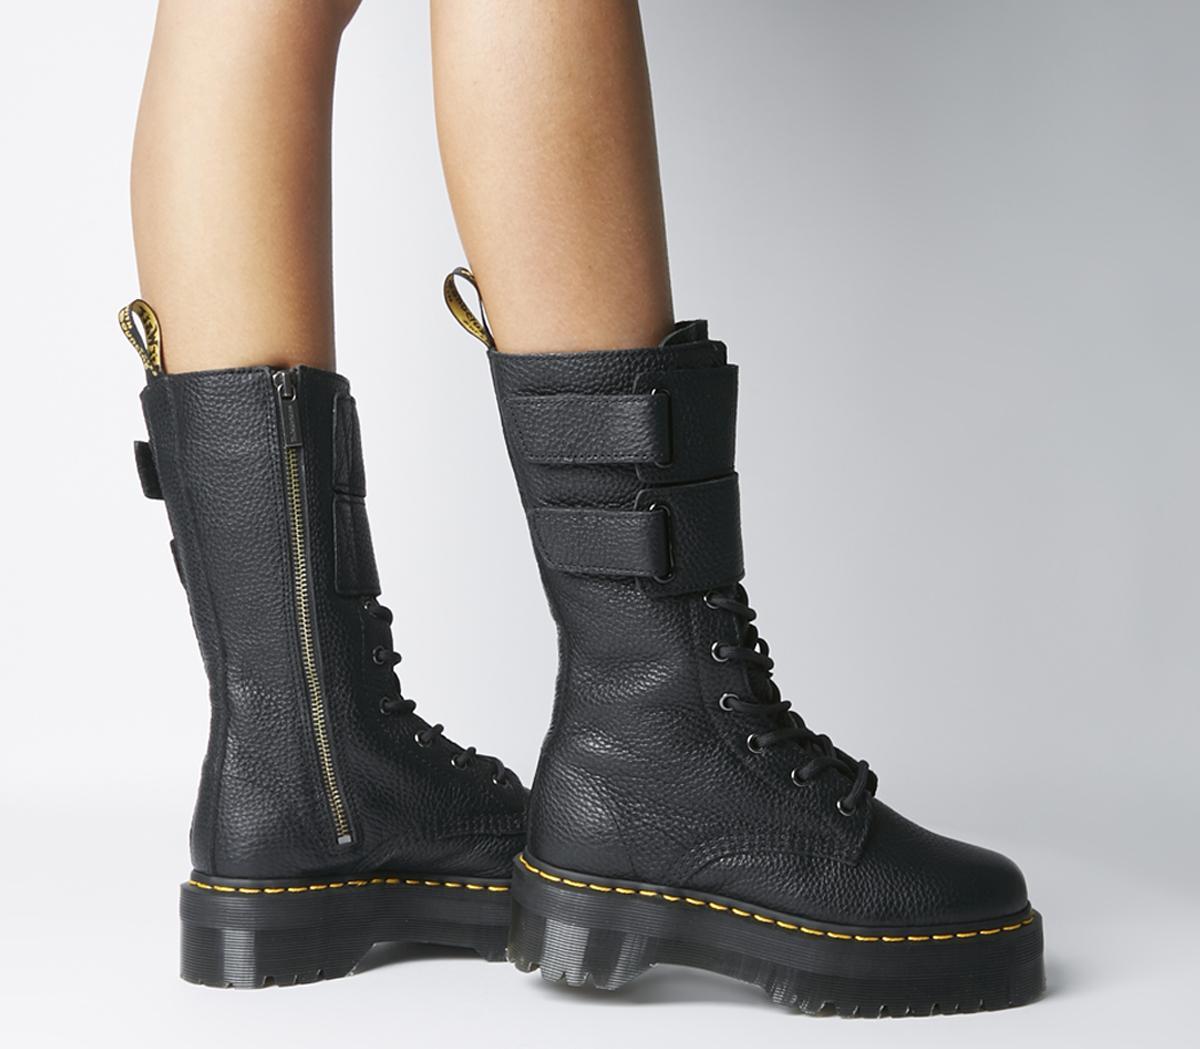 Jagger Platform Boots